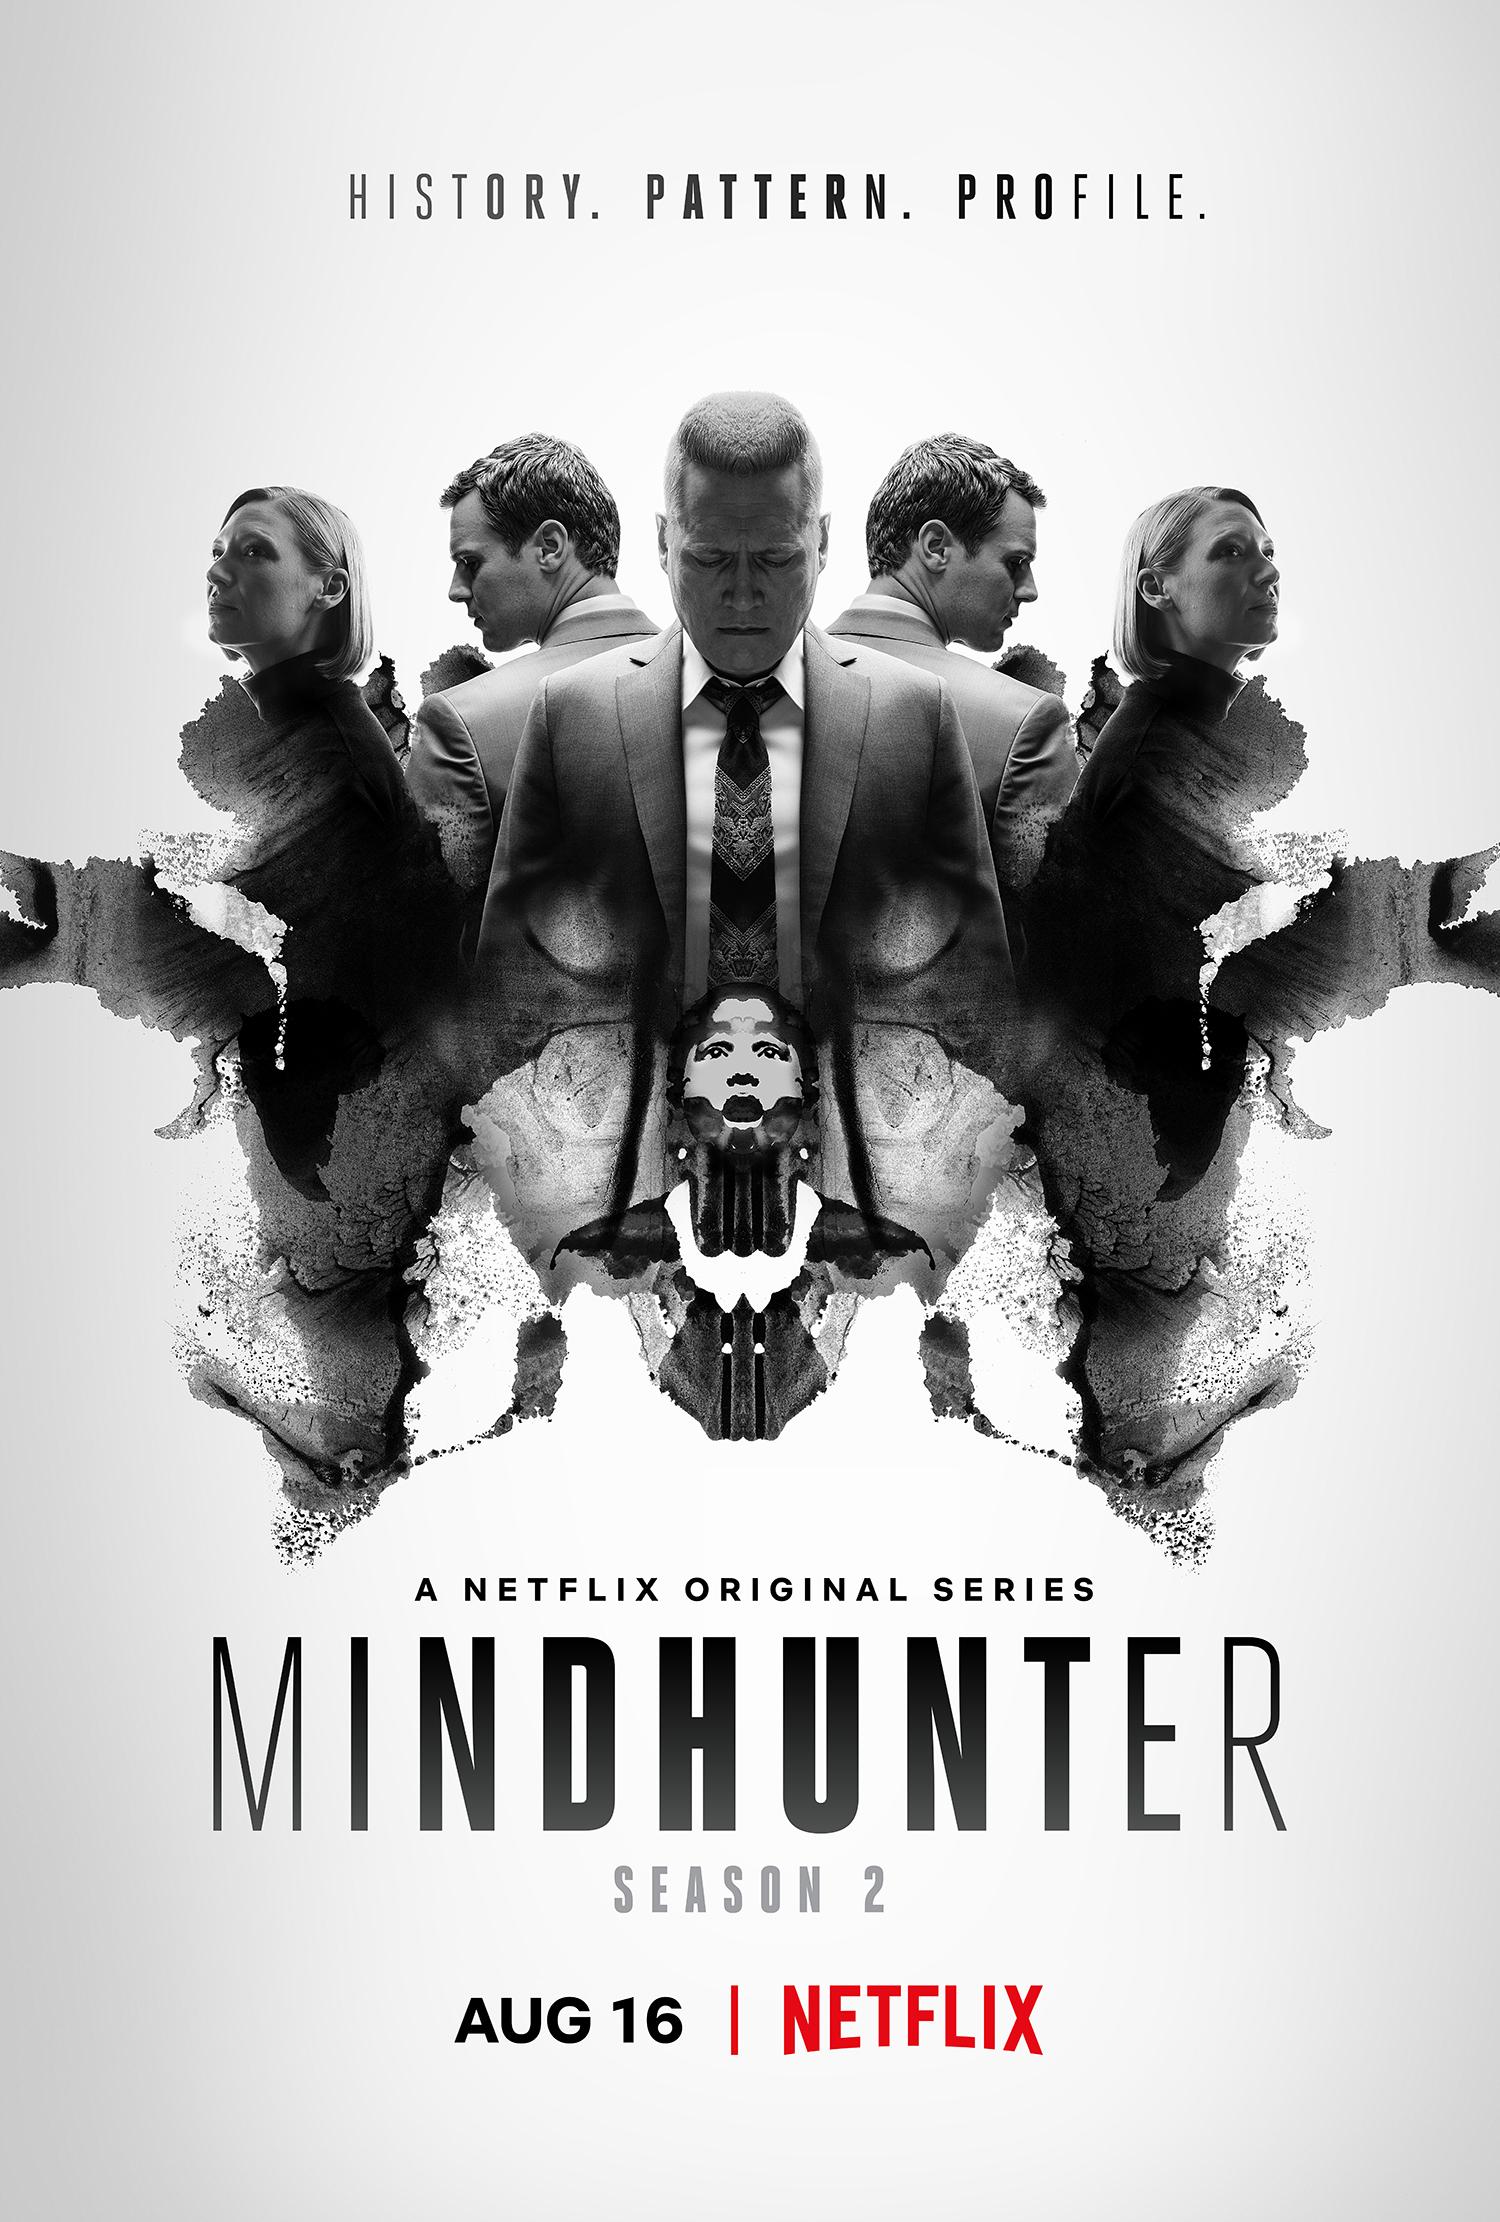 Mindhunter temporada 2 poster.jpg